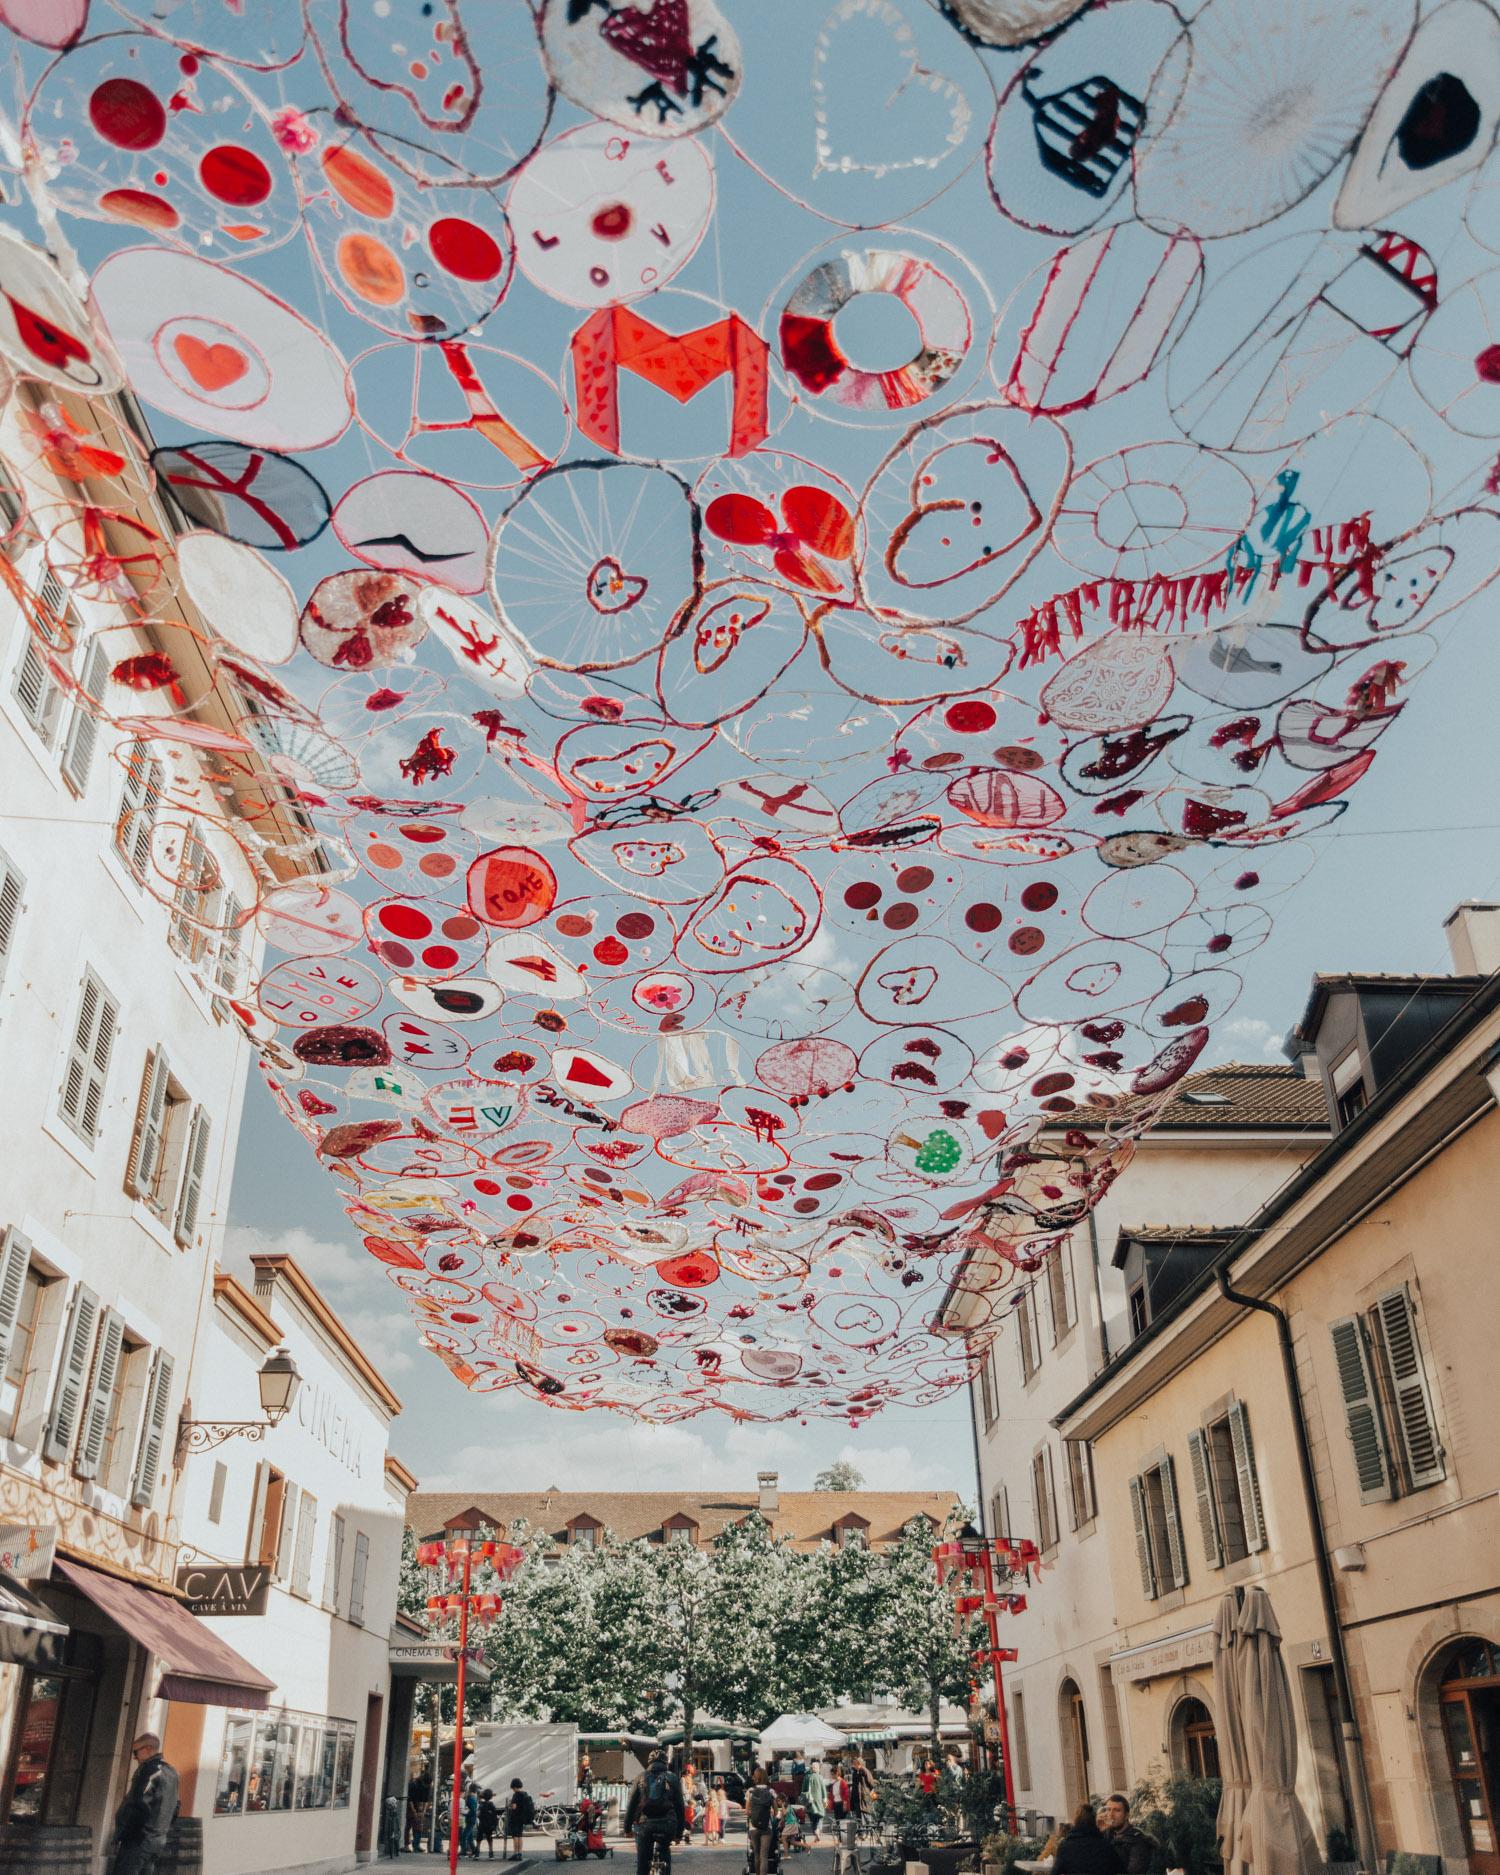 Street with creative artwork in the bohemian district Carouge in Geneva, Switzerland